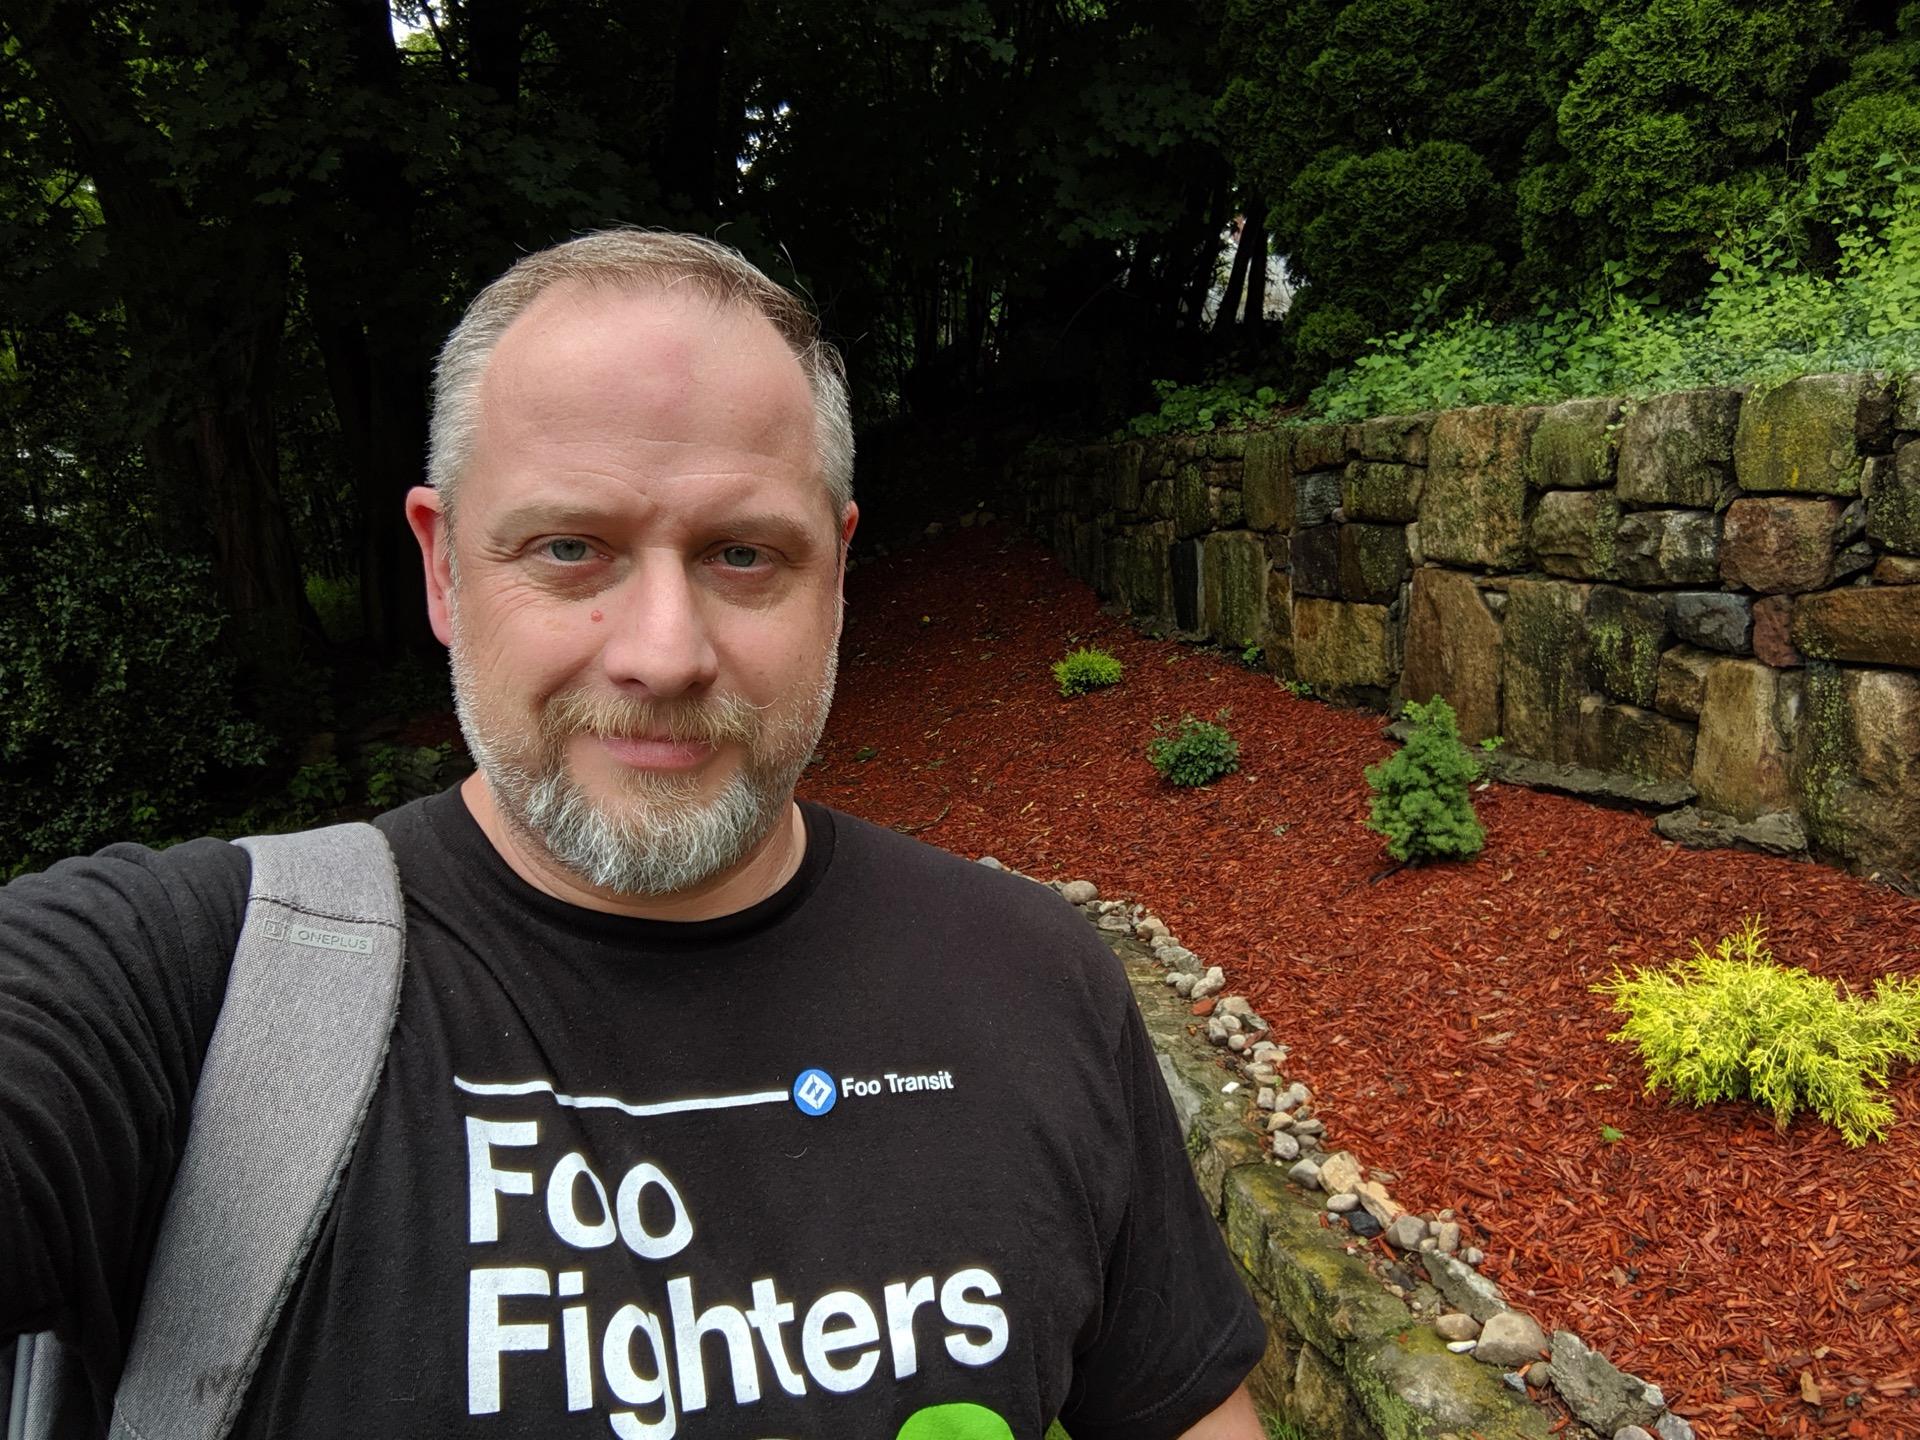 Google Pixel 3a XL Camera Review Selfie landscaping